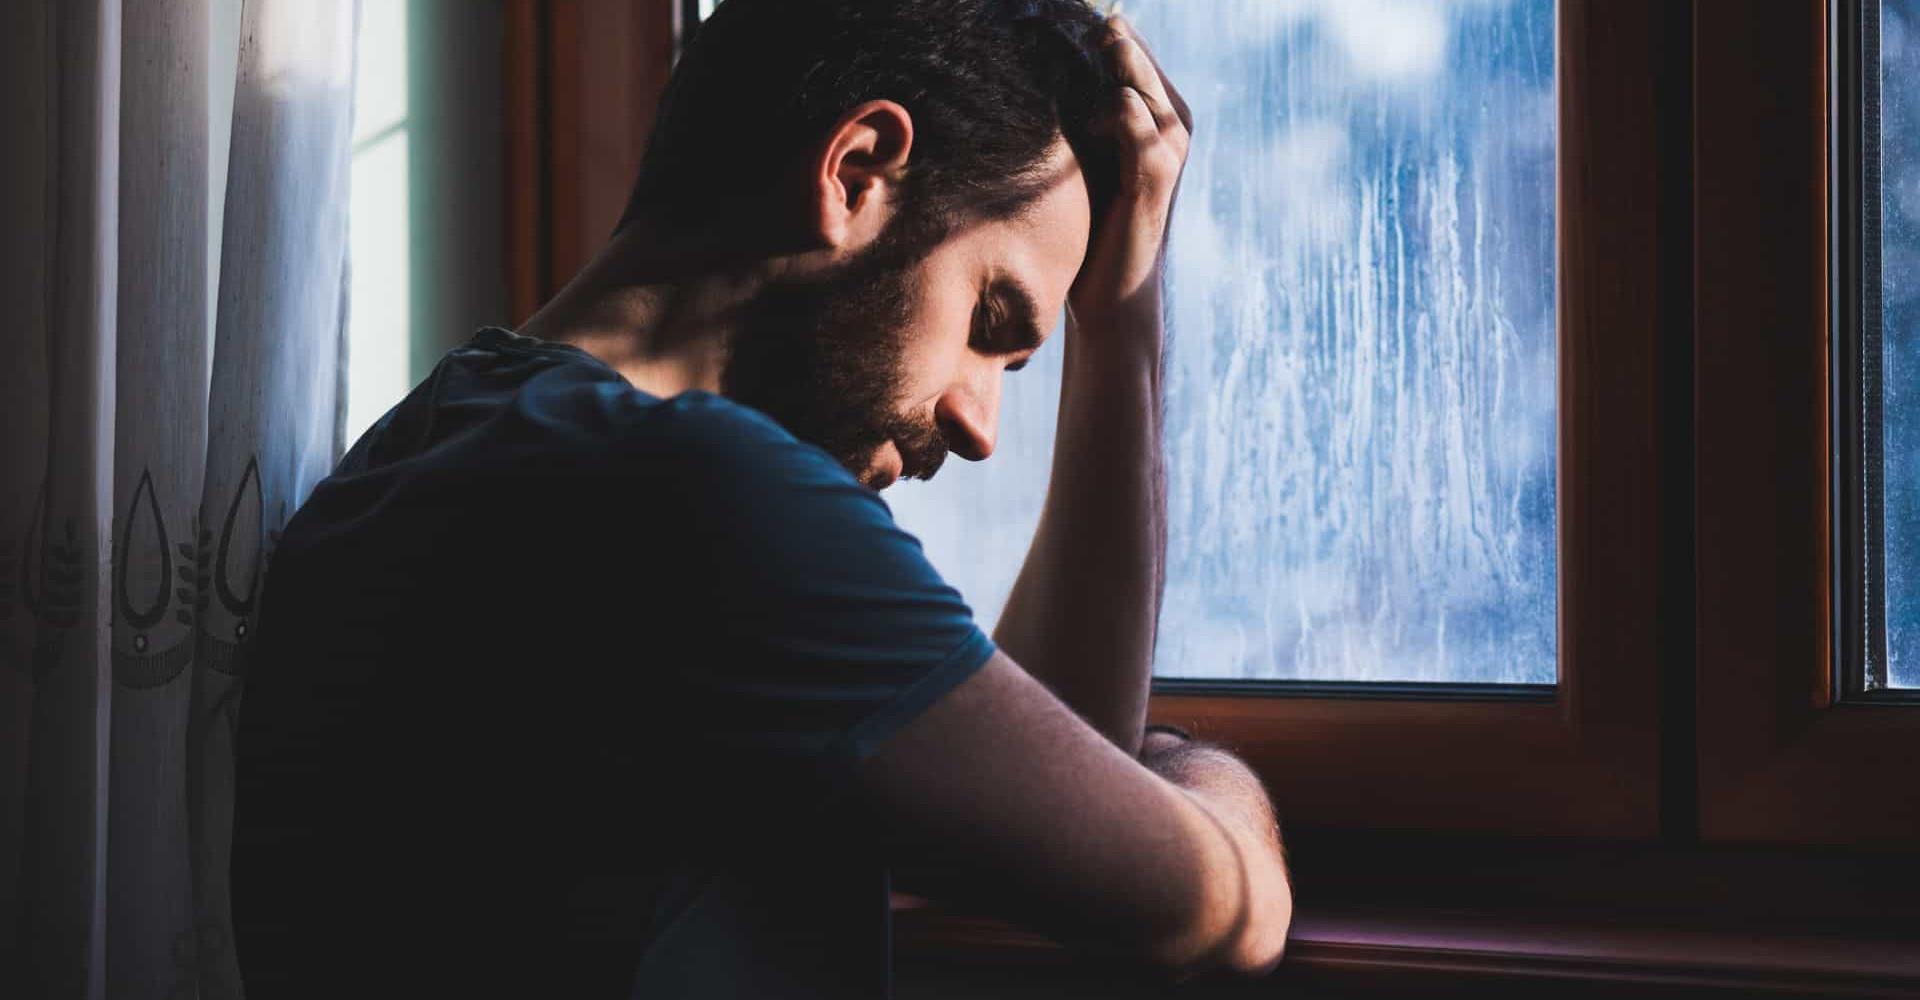 Auch Männer leiden an postkoitaler Traurigkeit